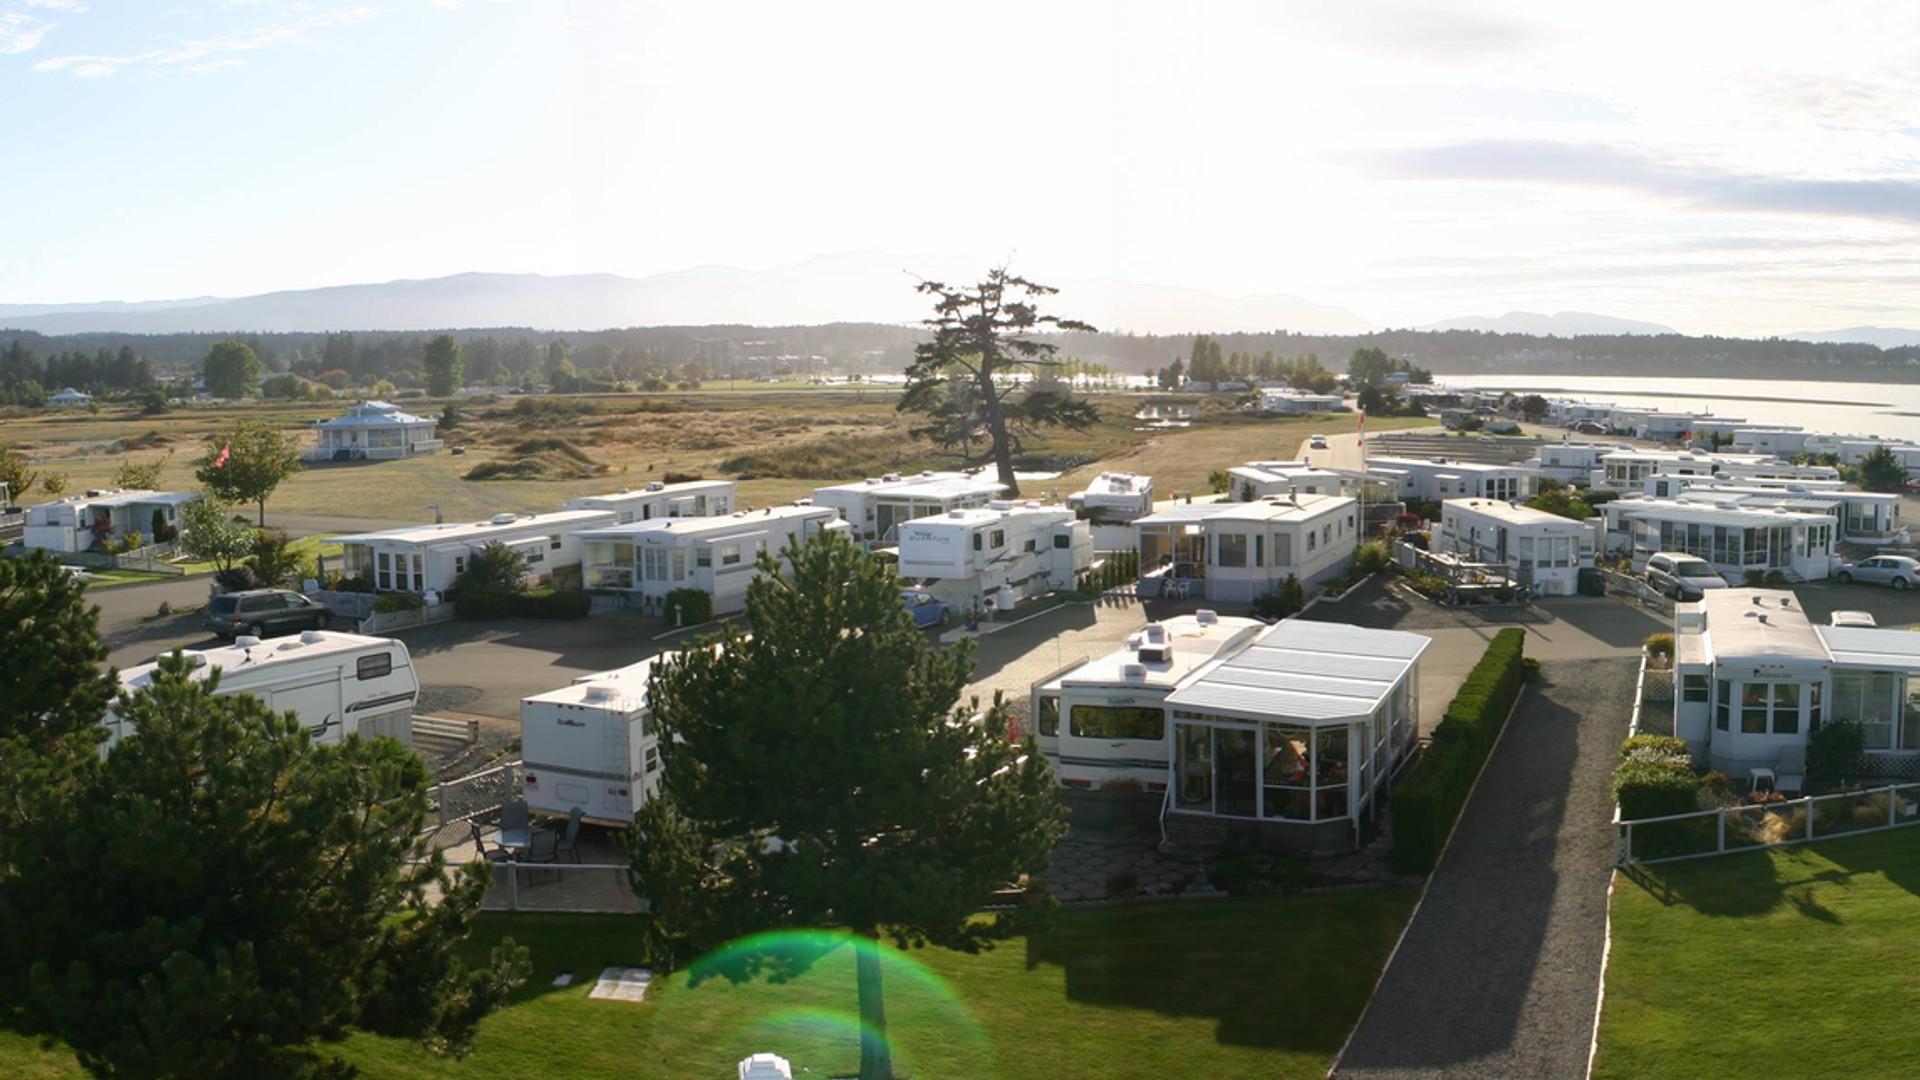 trailers_rv_park_Surfside_panorama.jpg